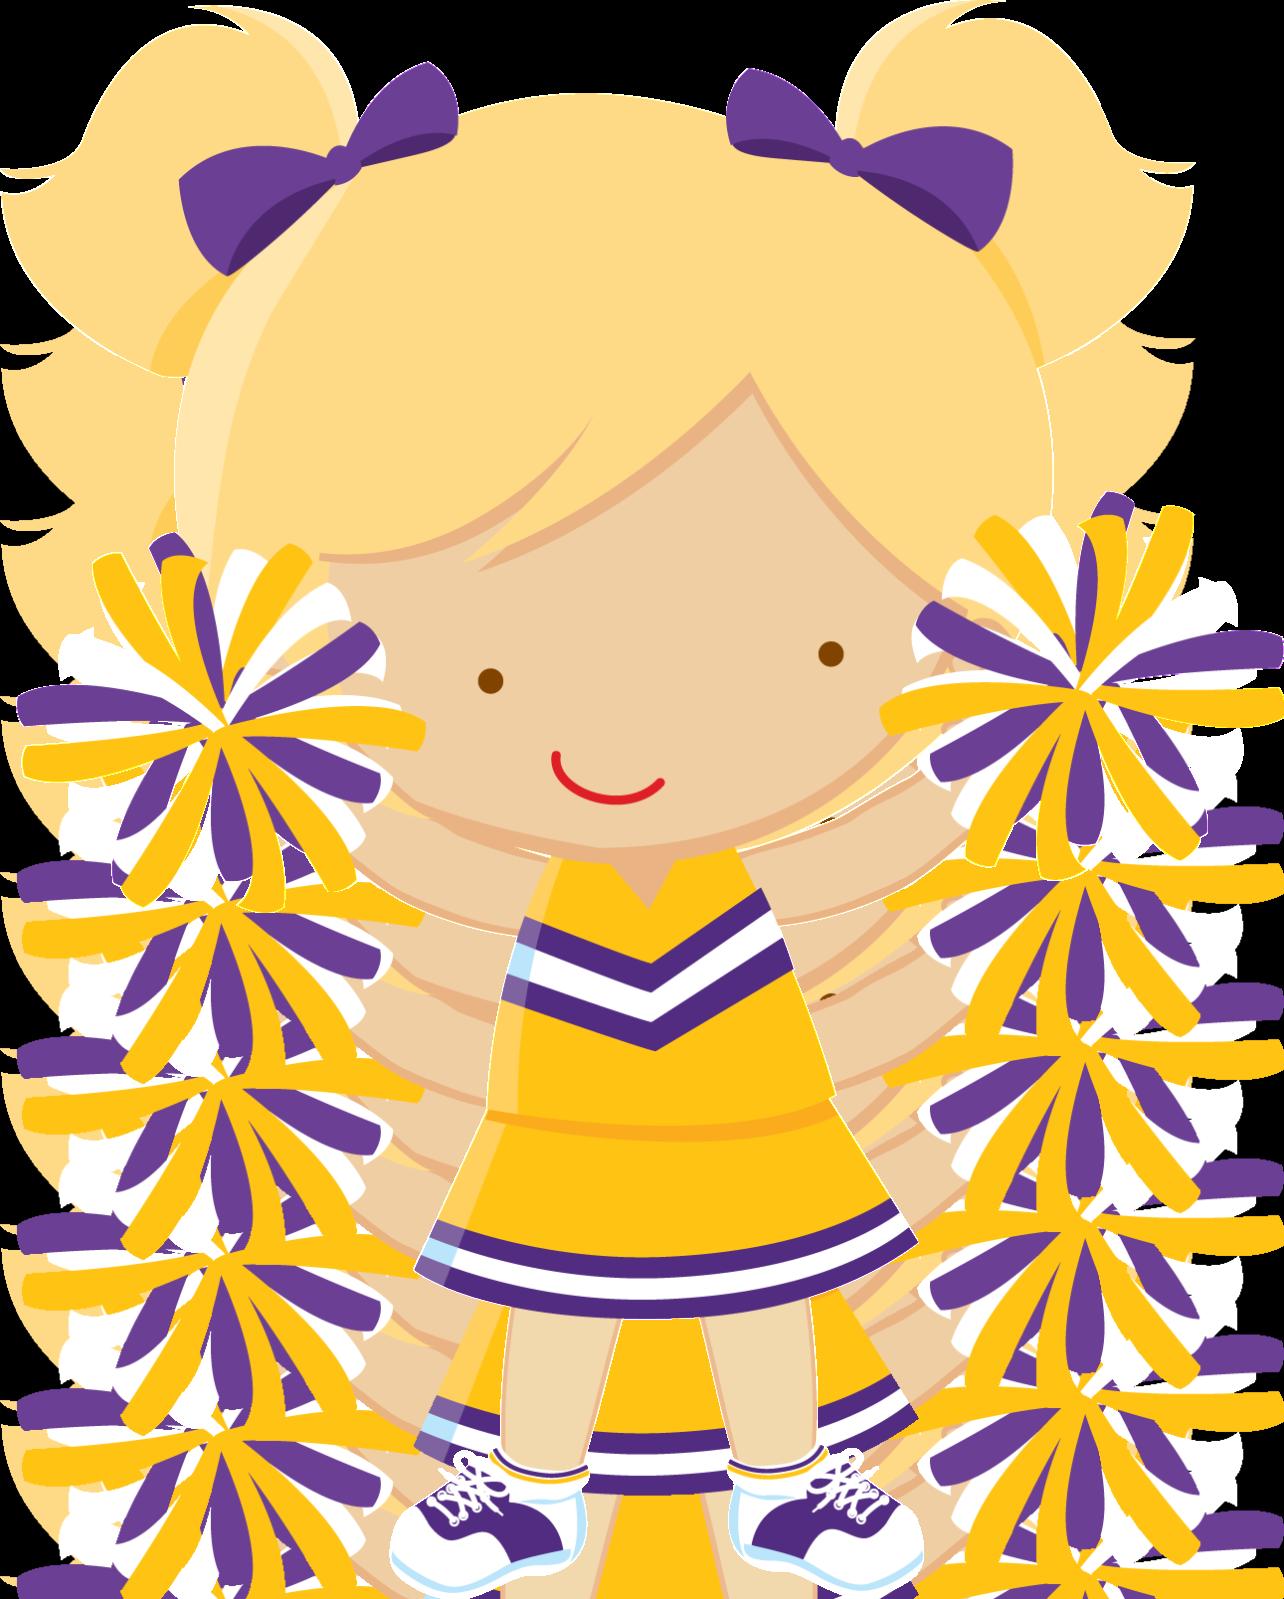 Sports gin stica imagenes. Words clipart cheerleader